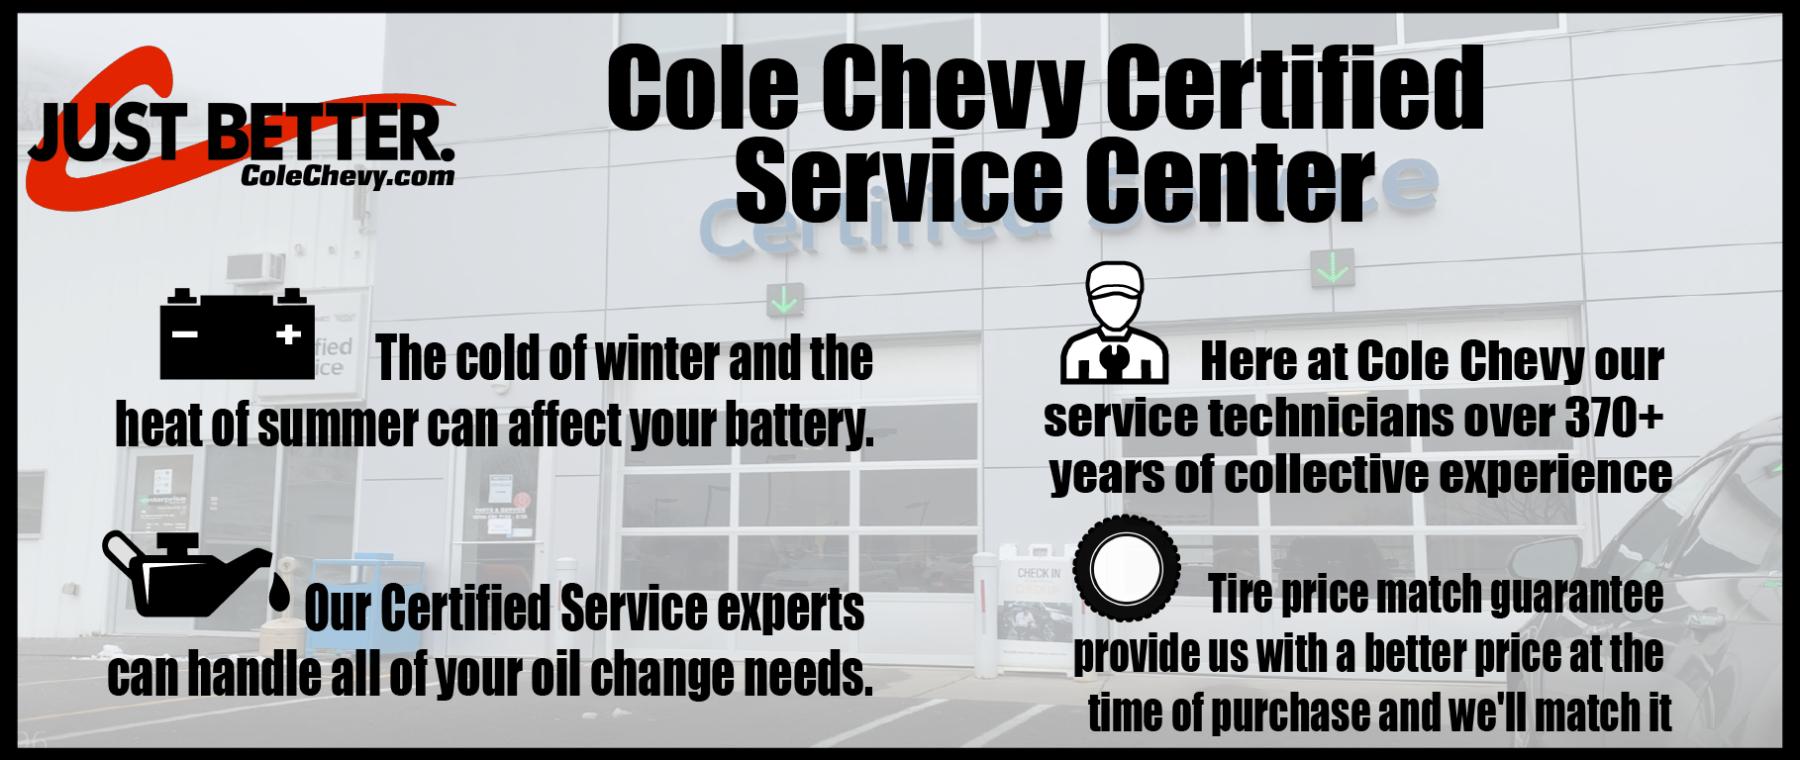 CC Certified Service Center Desktop